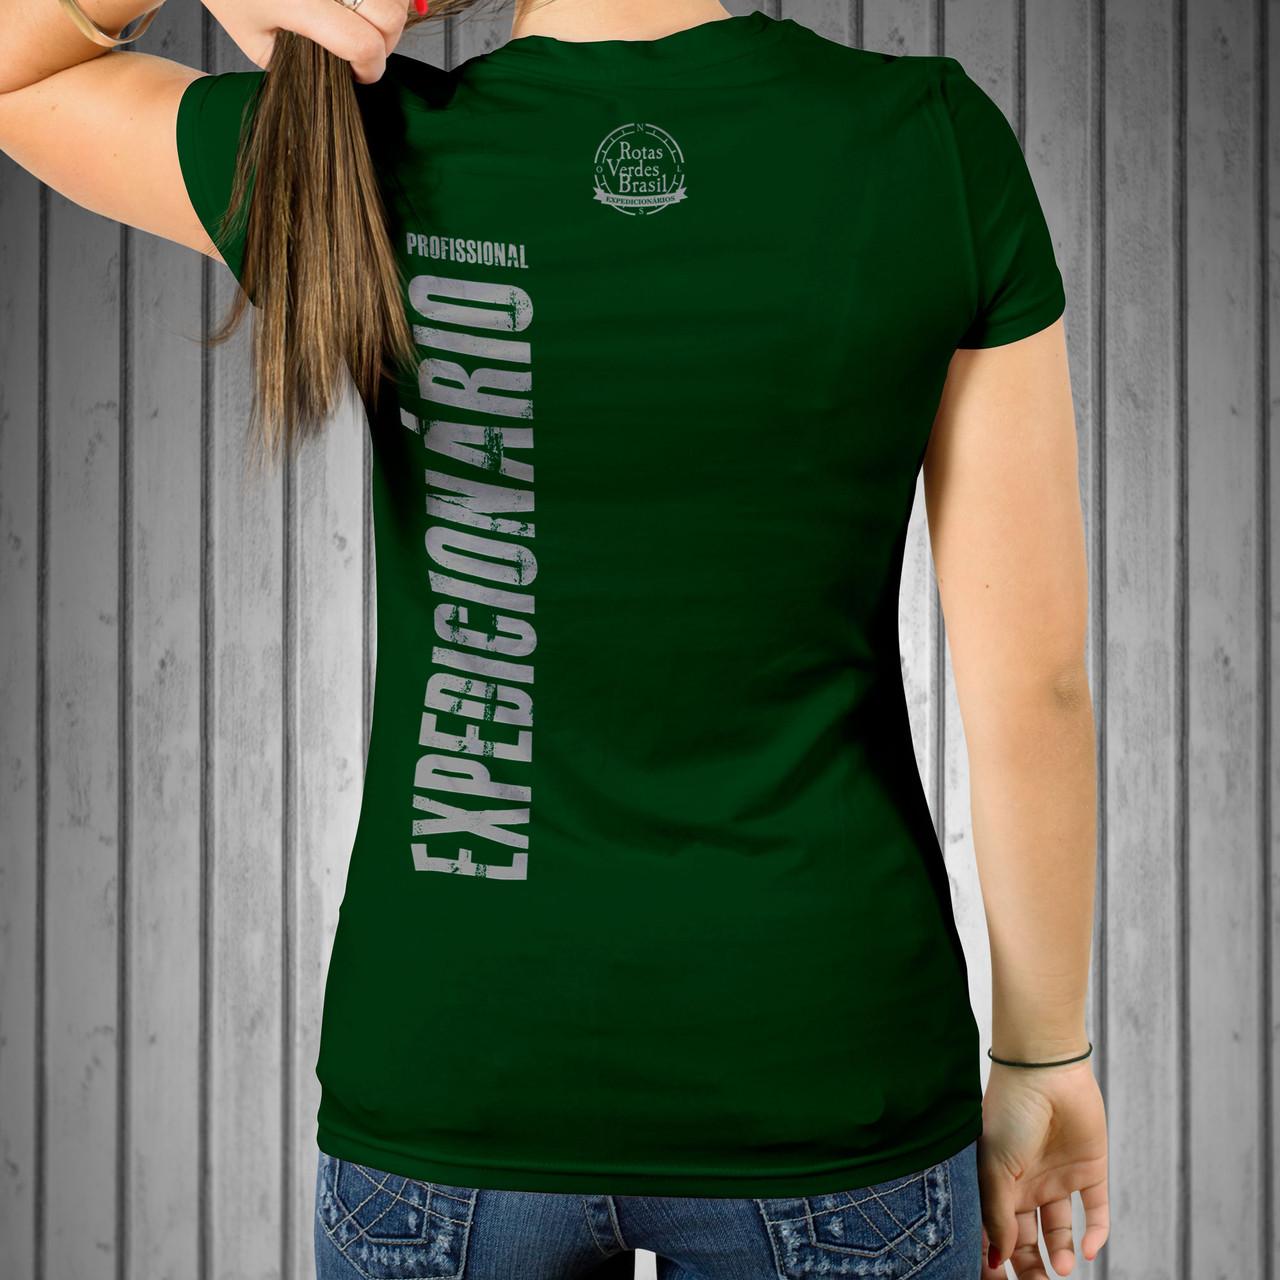 Female-Tshirt-Mockup-Back_verde (1)